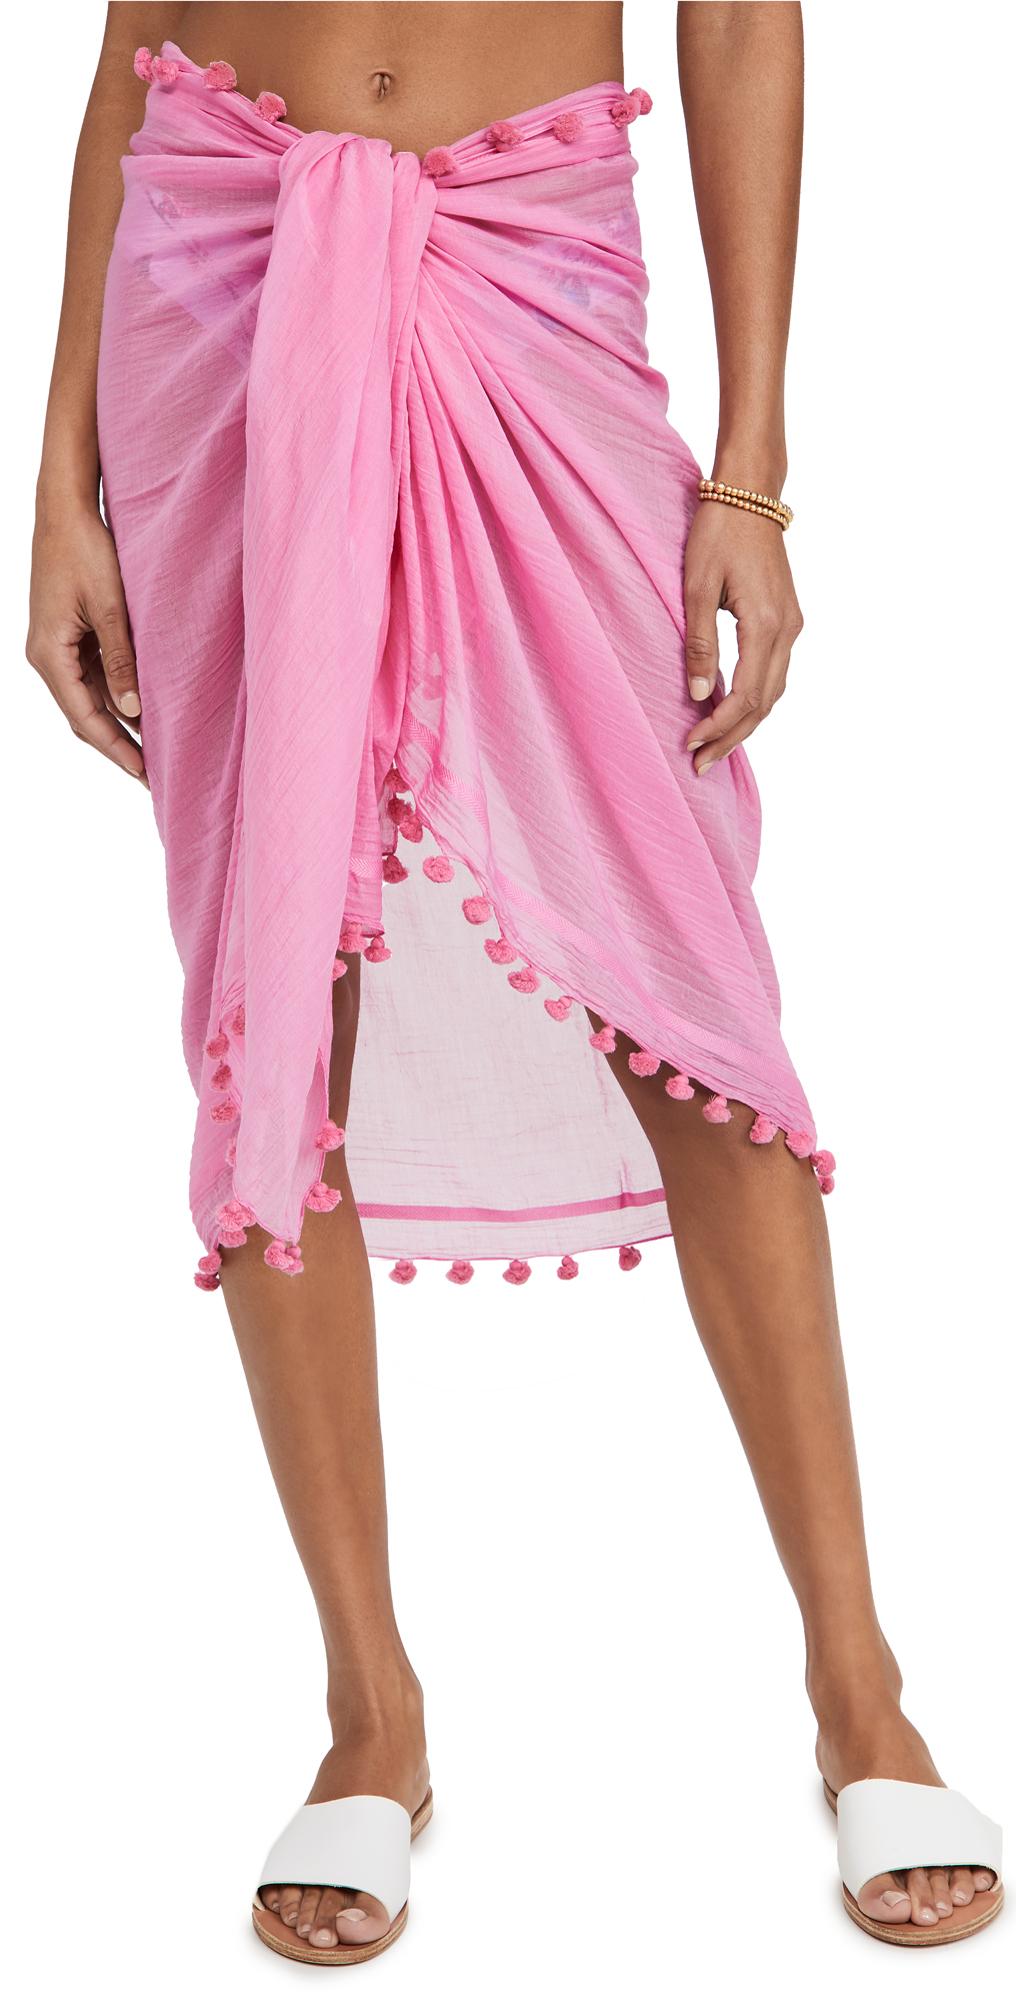 Melissa Odabash Pareo Cover Up Skirt